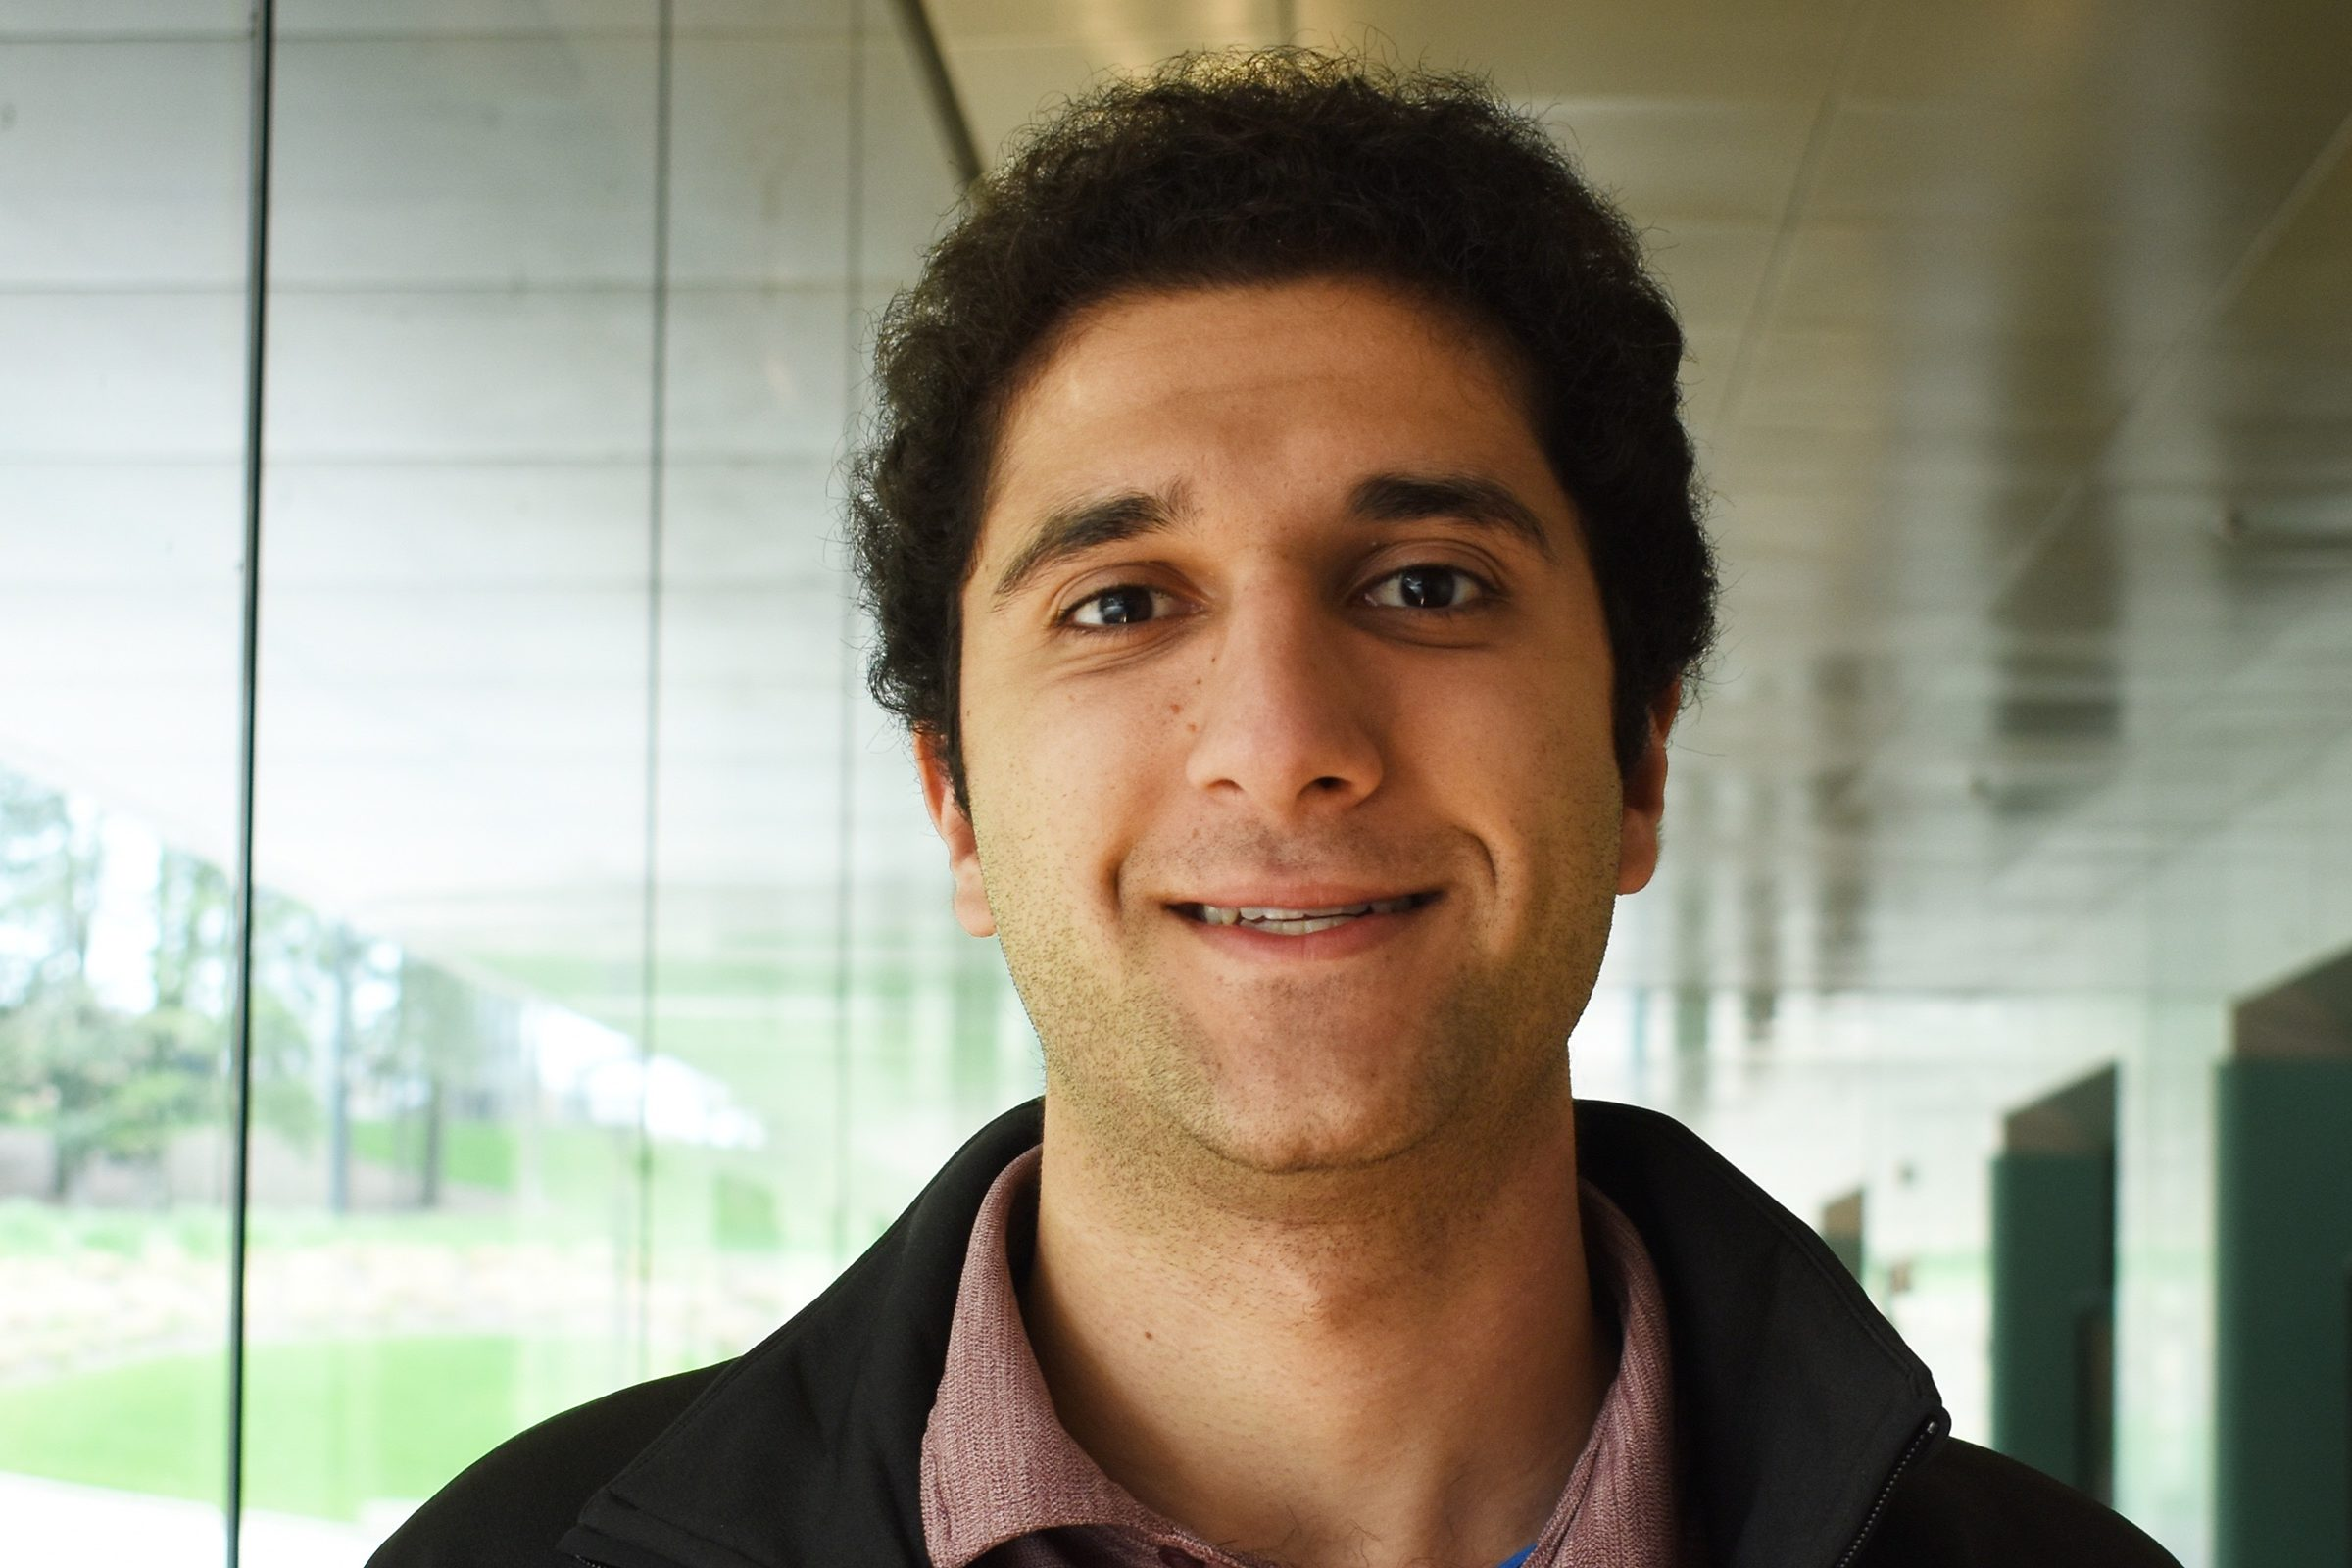 Samir Nooshabadi